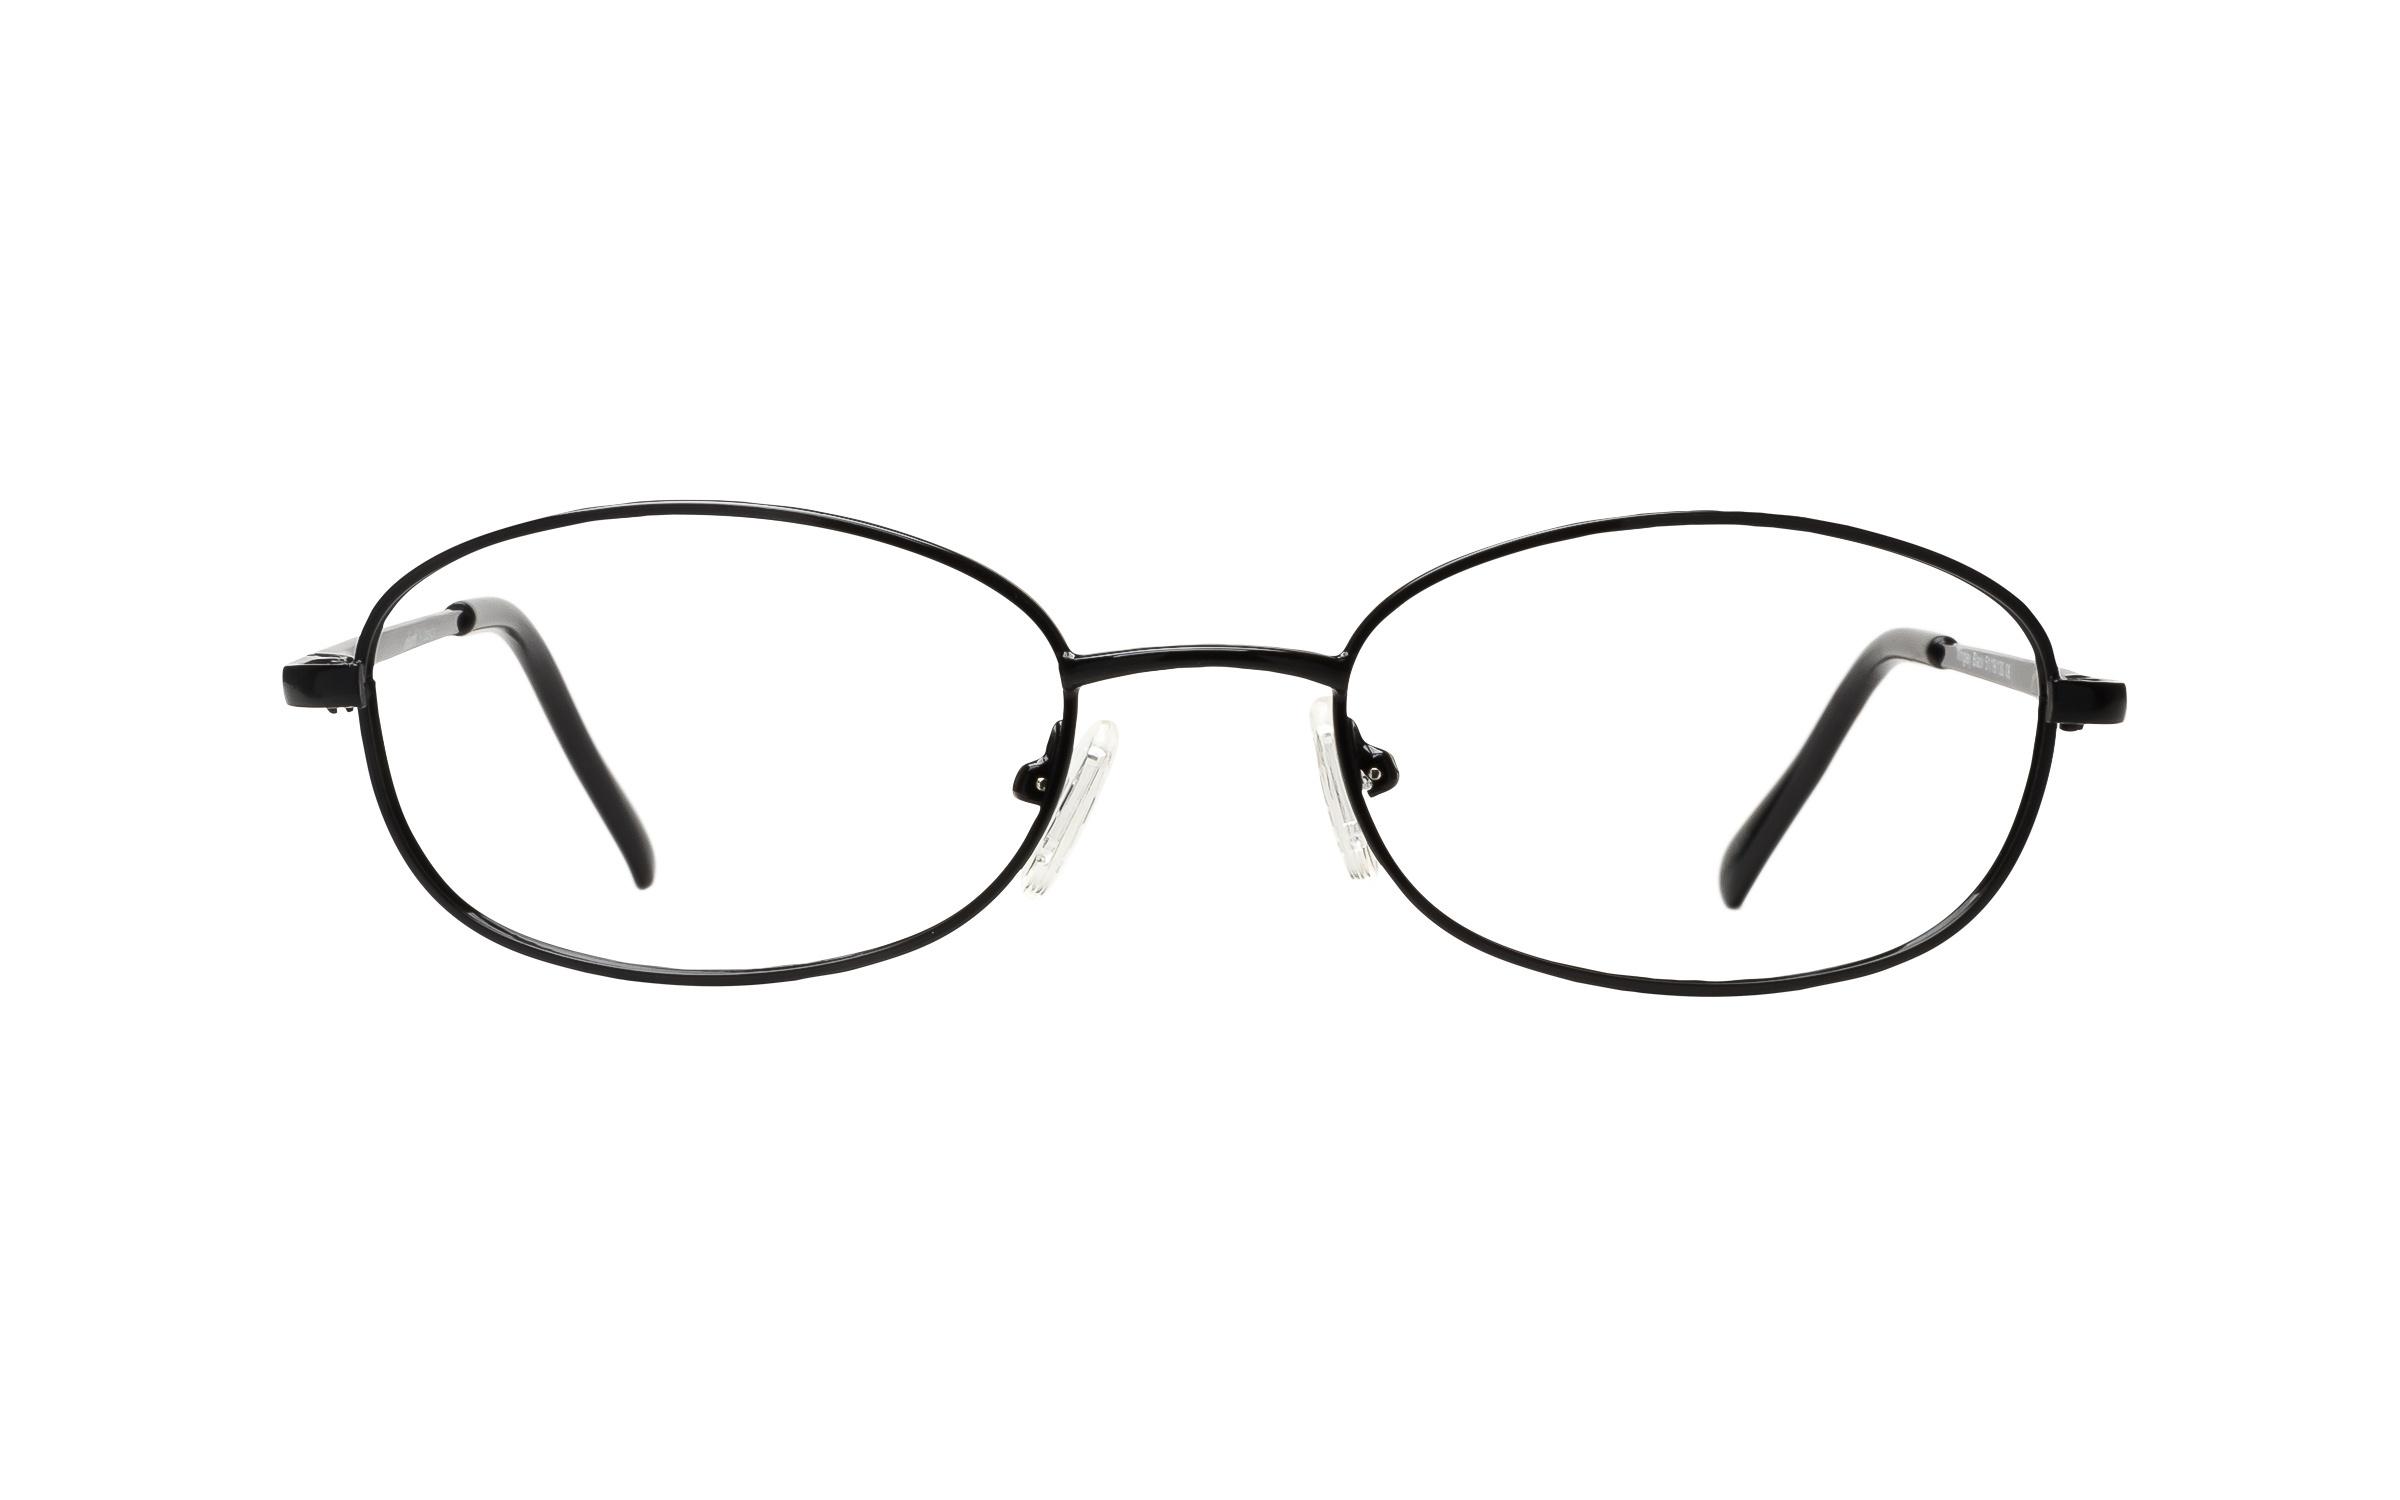 Clearly Basics Wrigley (51) Eyeglasses and Frame in Black | Plastic - Online Coastal